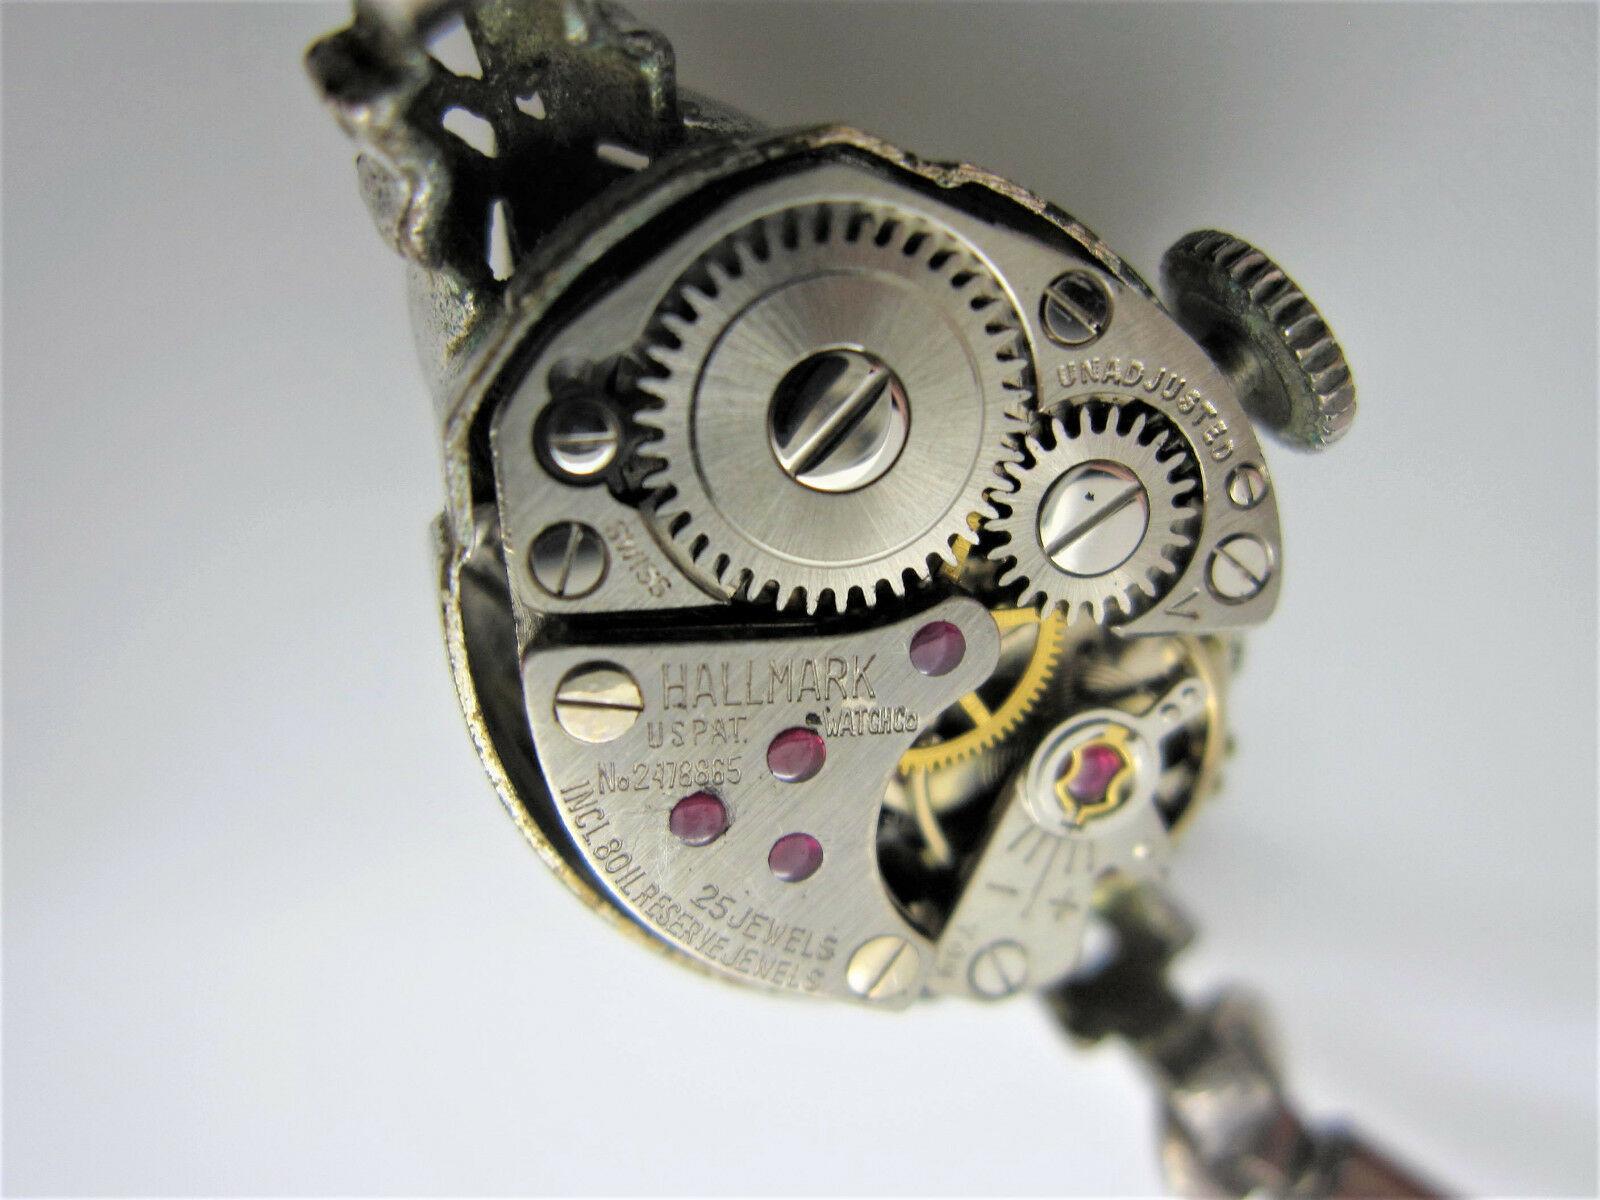 Vintage Women's Hallmark 25 Jewels 10k Rolled Gold Plated Hand Wind Watch image 5